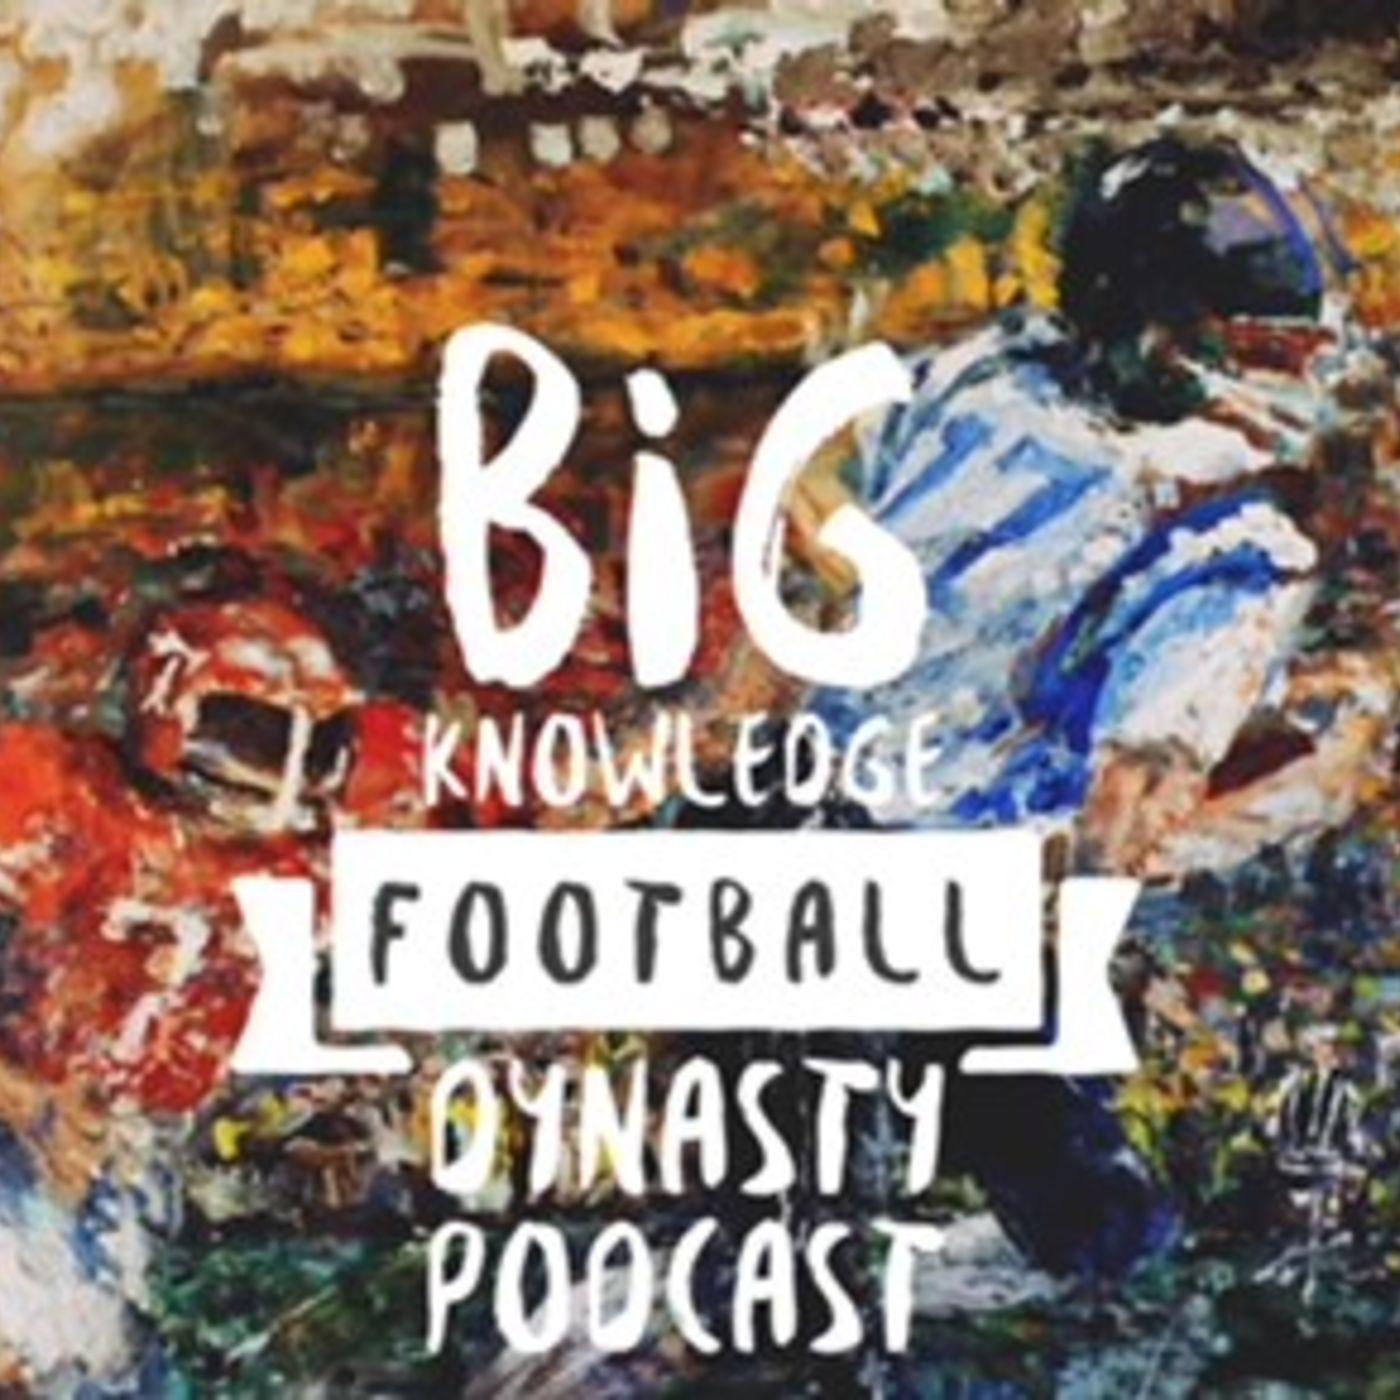 BKF Dynasty Football Podcast | Listen via Stitcher for Podcasts